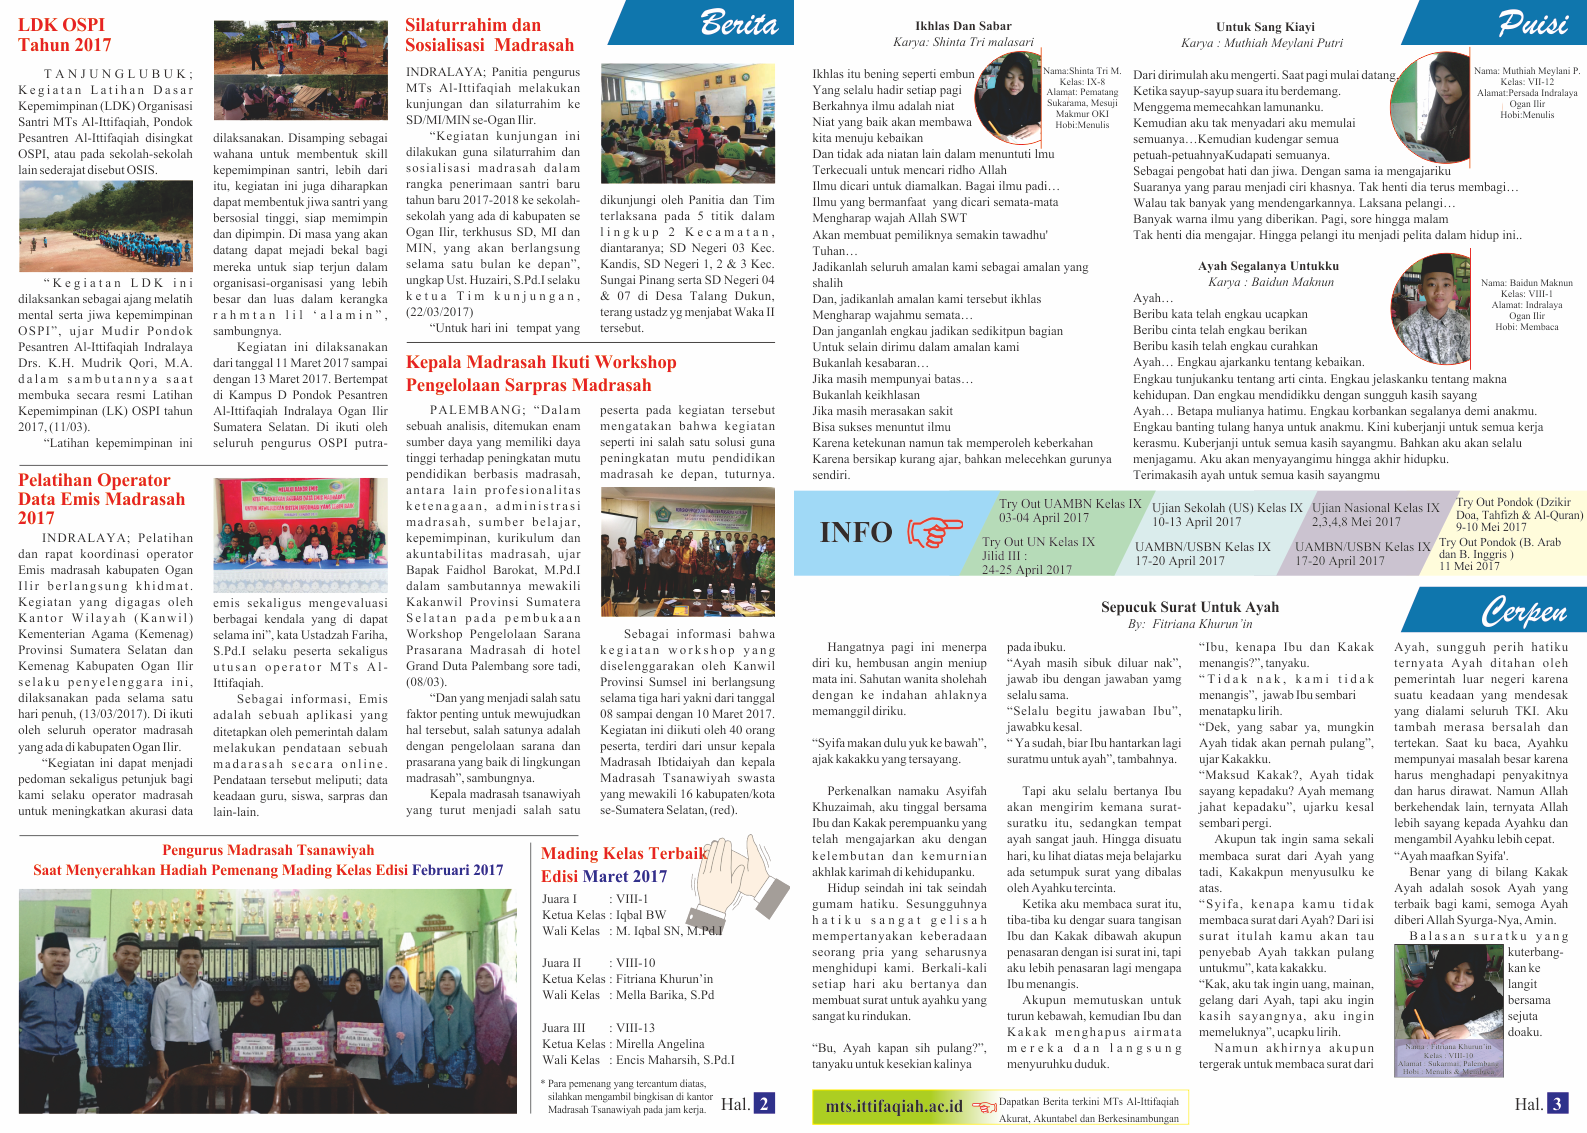 buletin-samawi-edisi-maret-2017-2